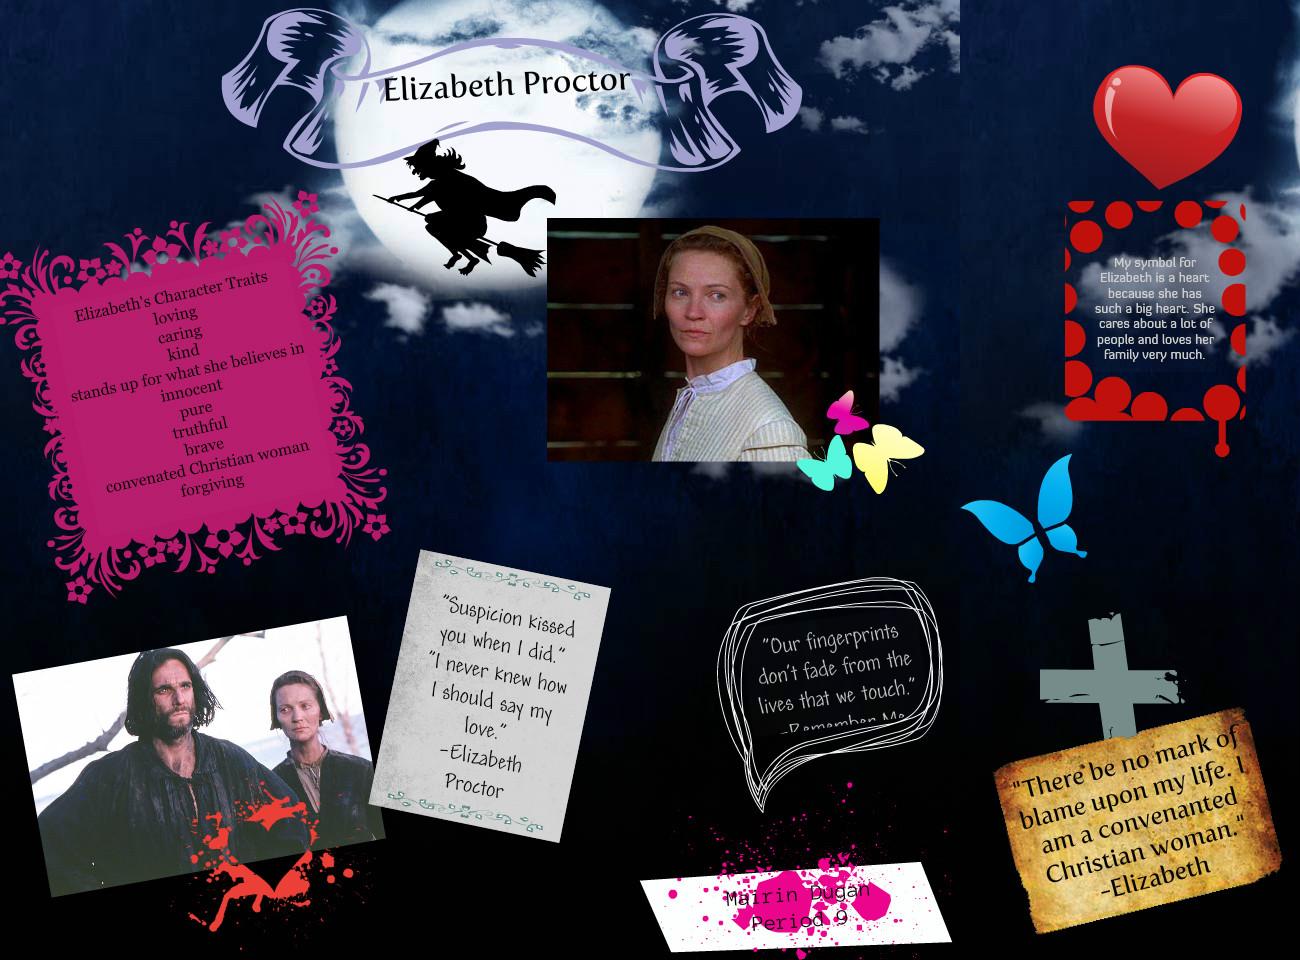 Character analysis essay on elizabeth proctor